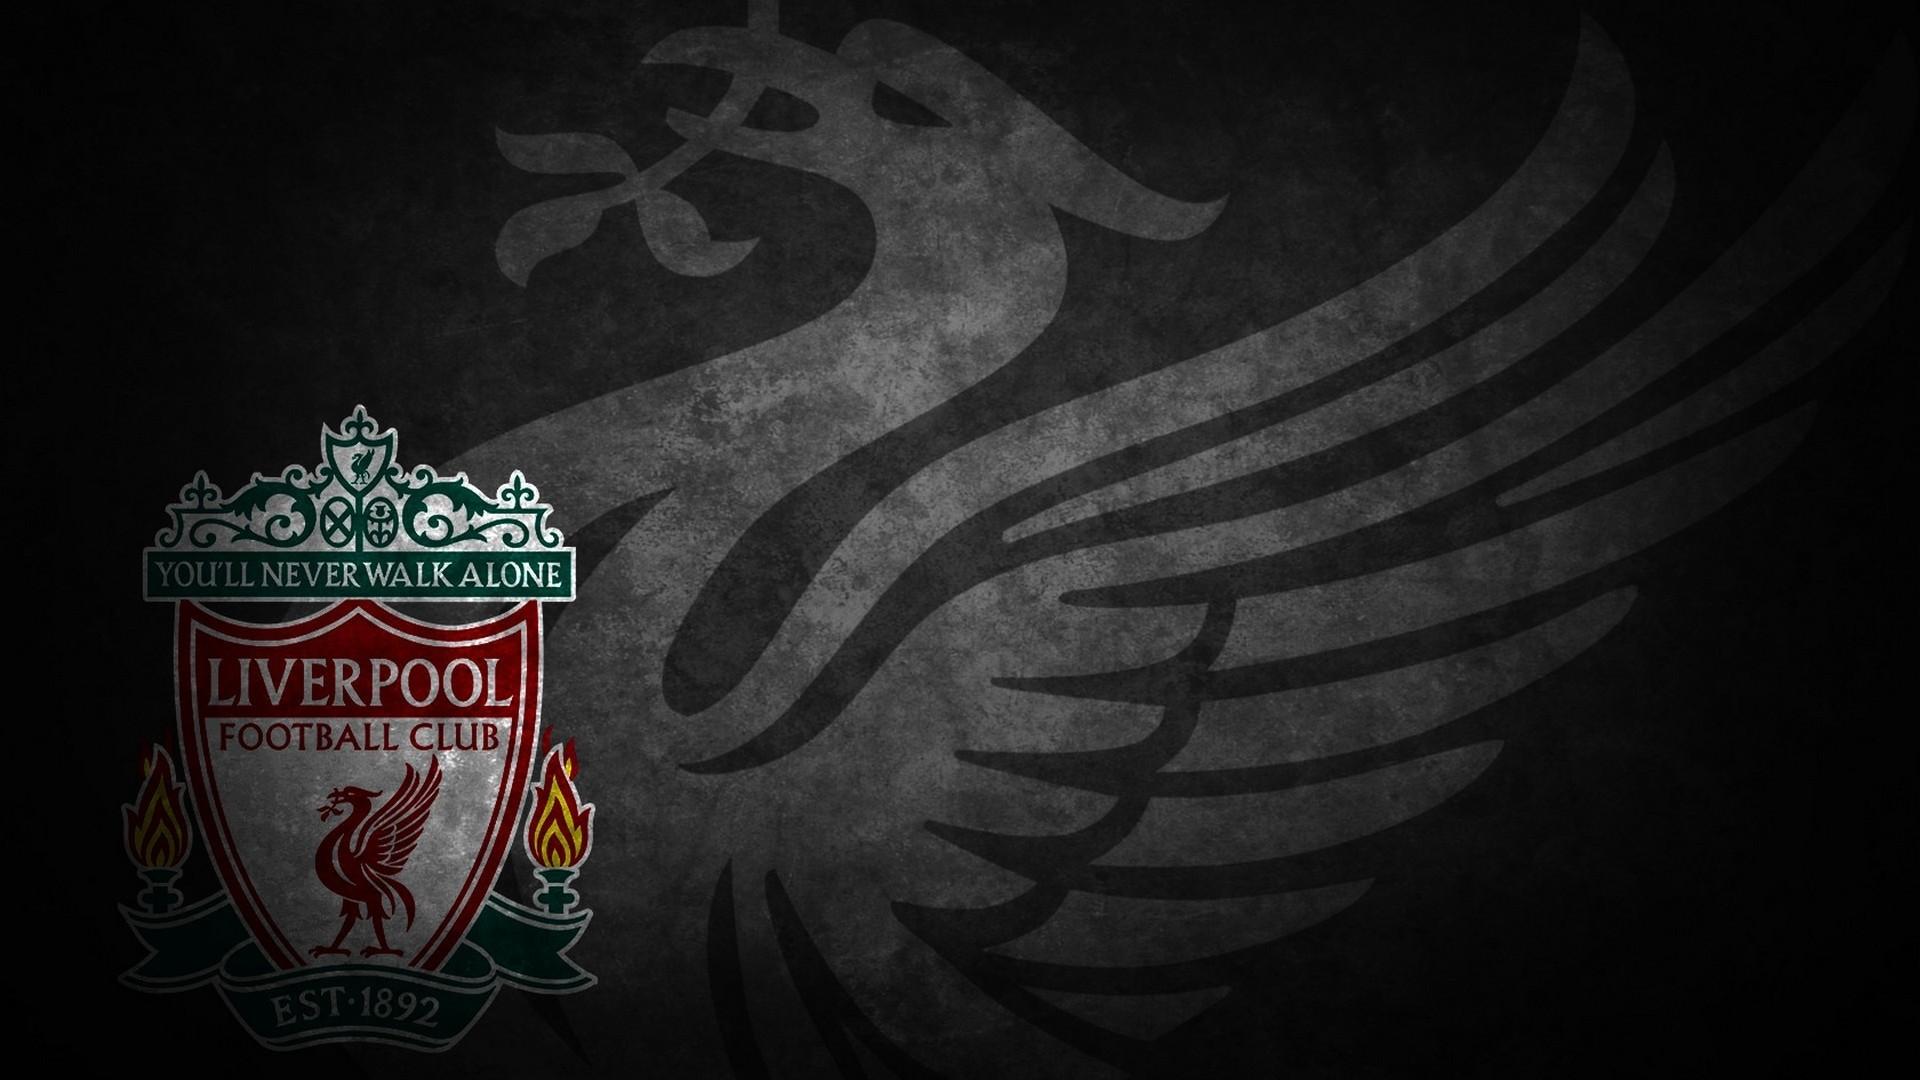 Liverpool Image